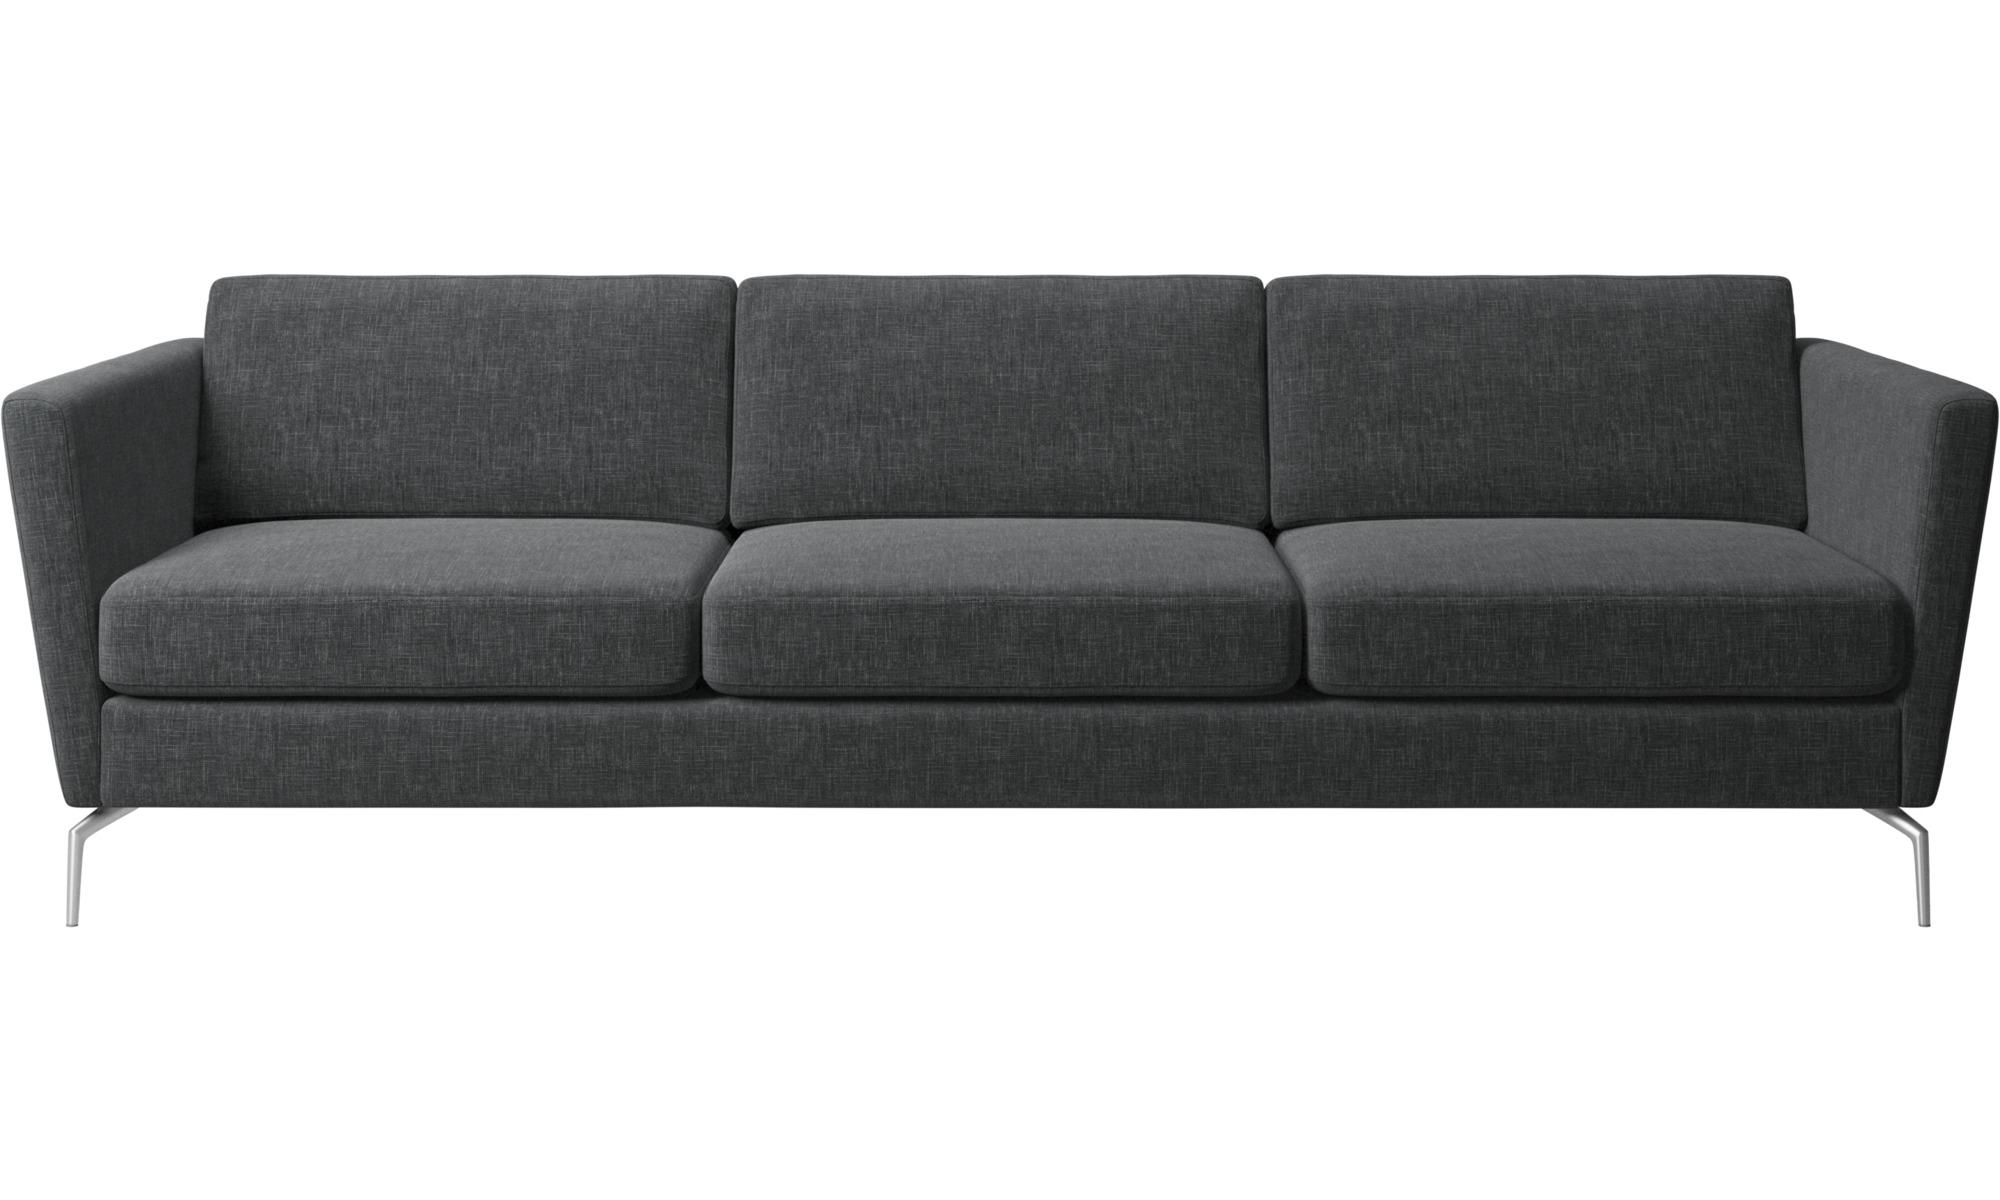 canap s 3 places canap osaka assise classique boconcept. Black Bedroom Furniture Sets. Home Design Ideas